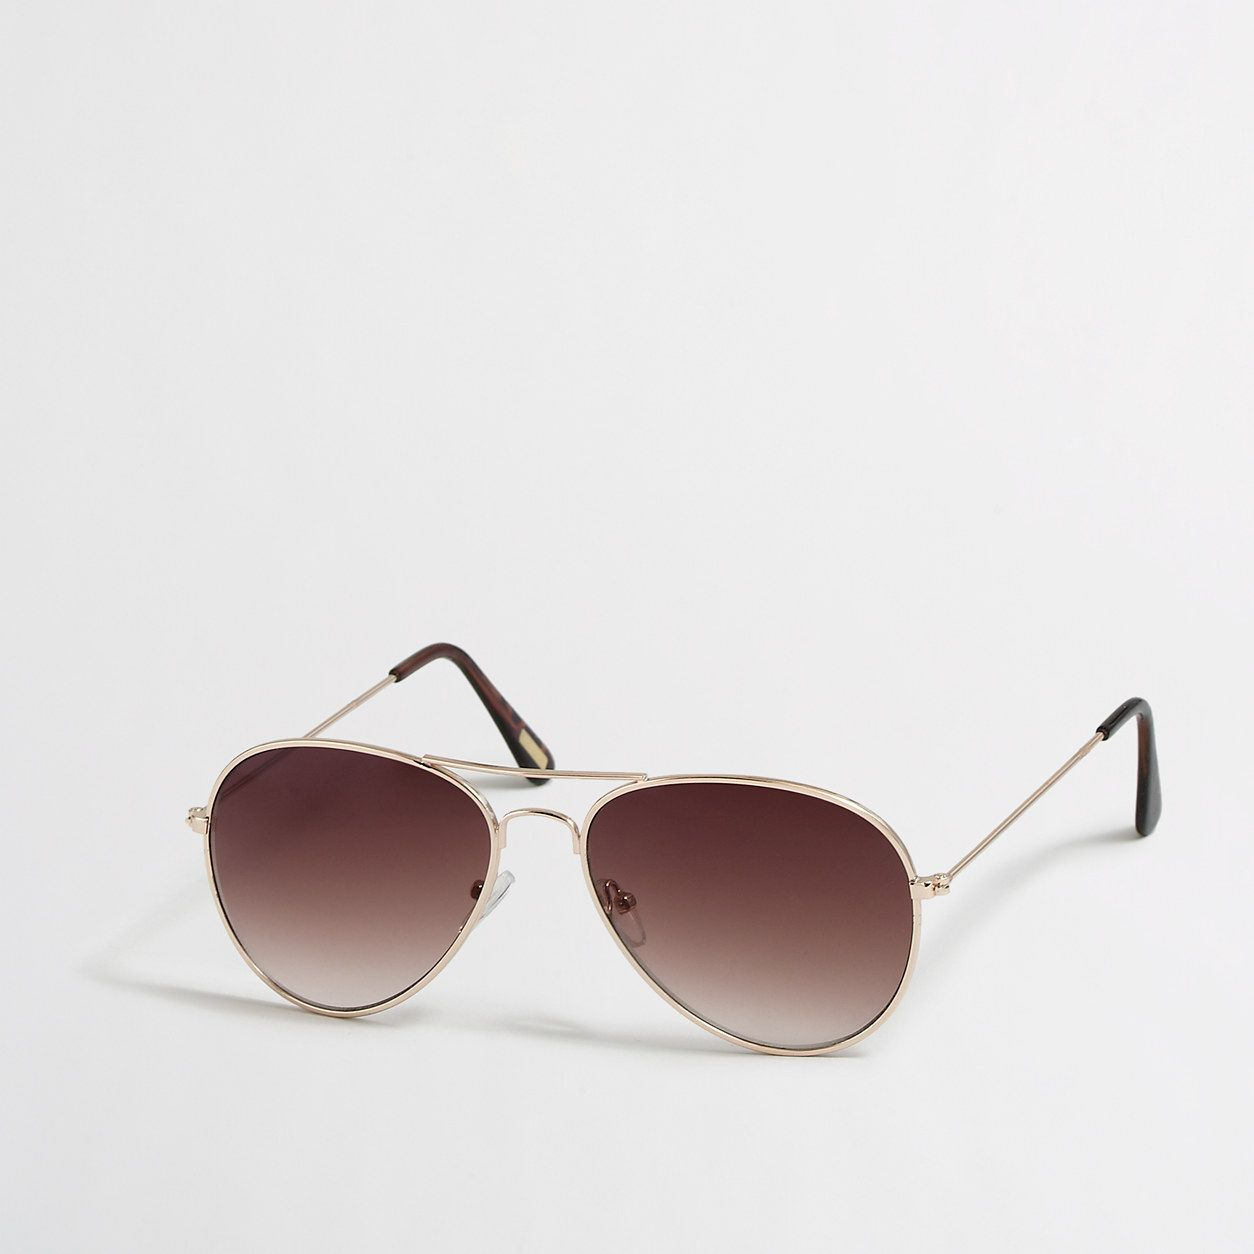 Factory aviator sunglasses sunglasses jcrew factory